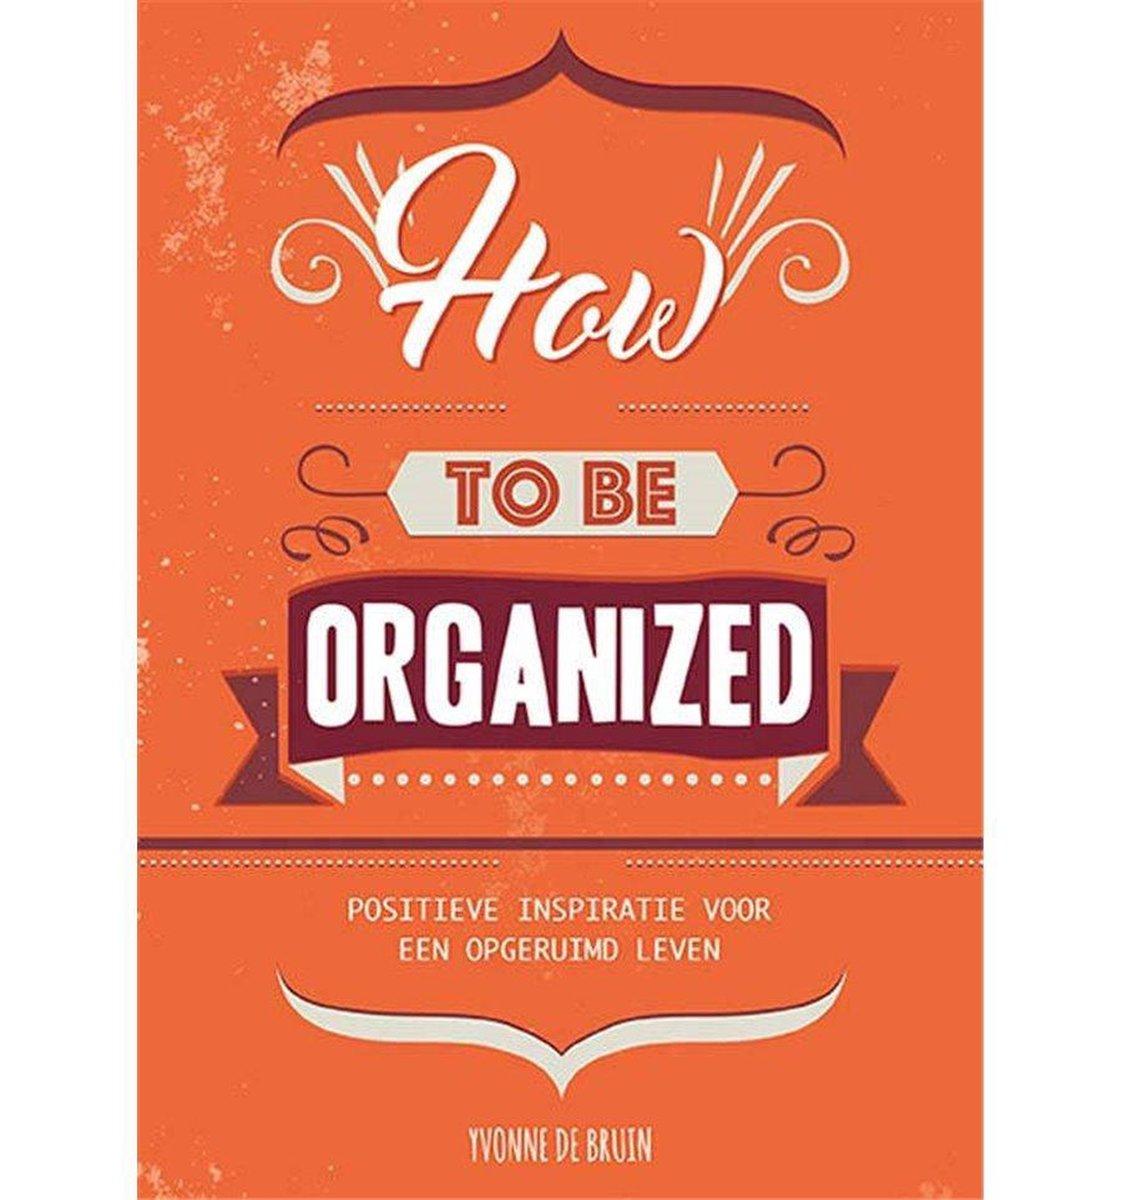 How to be organized - Yvonne de Bruin